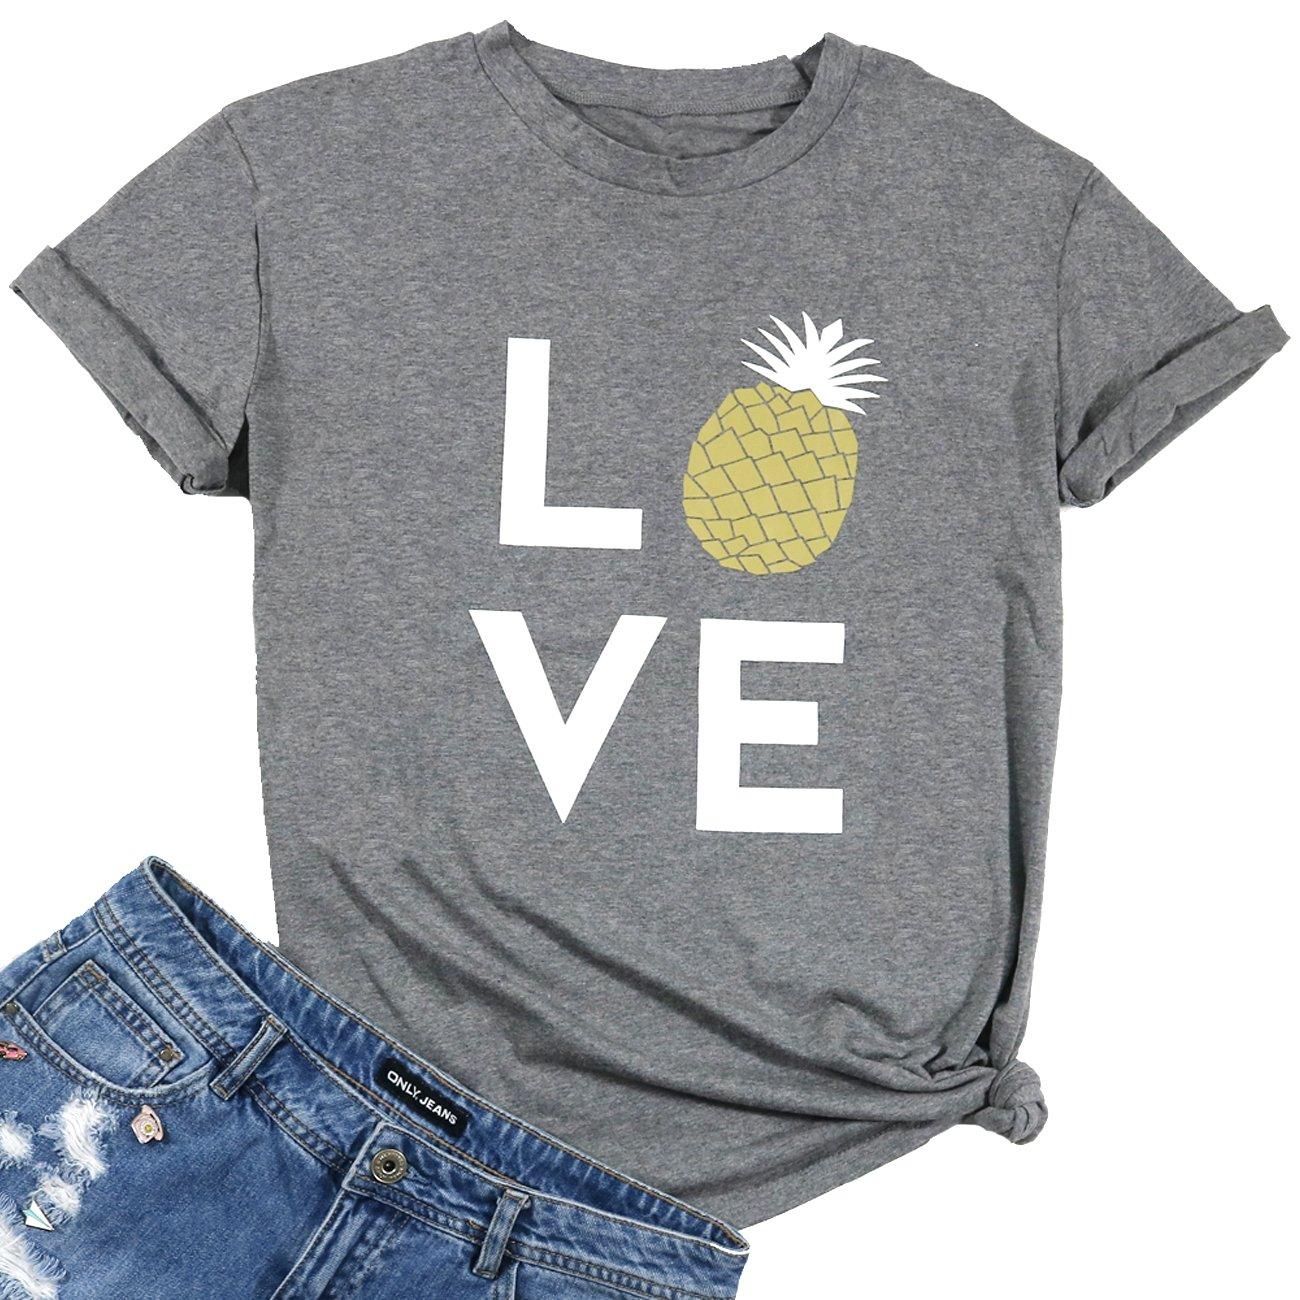 d3d0c68b6 Amazon.com: Women Love Pineapple Letters Print Funny T-Shirt Casual Short  Sleeve Blouse Tees: Clothing